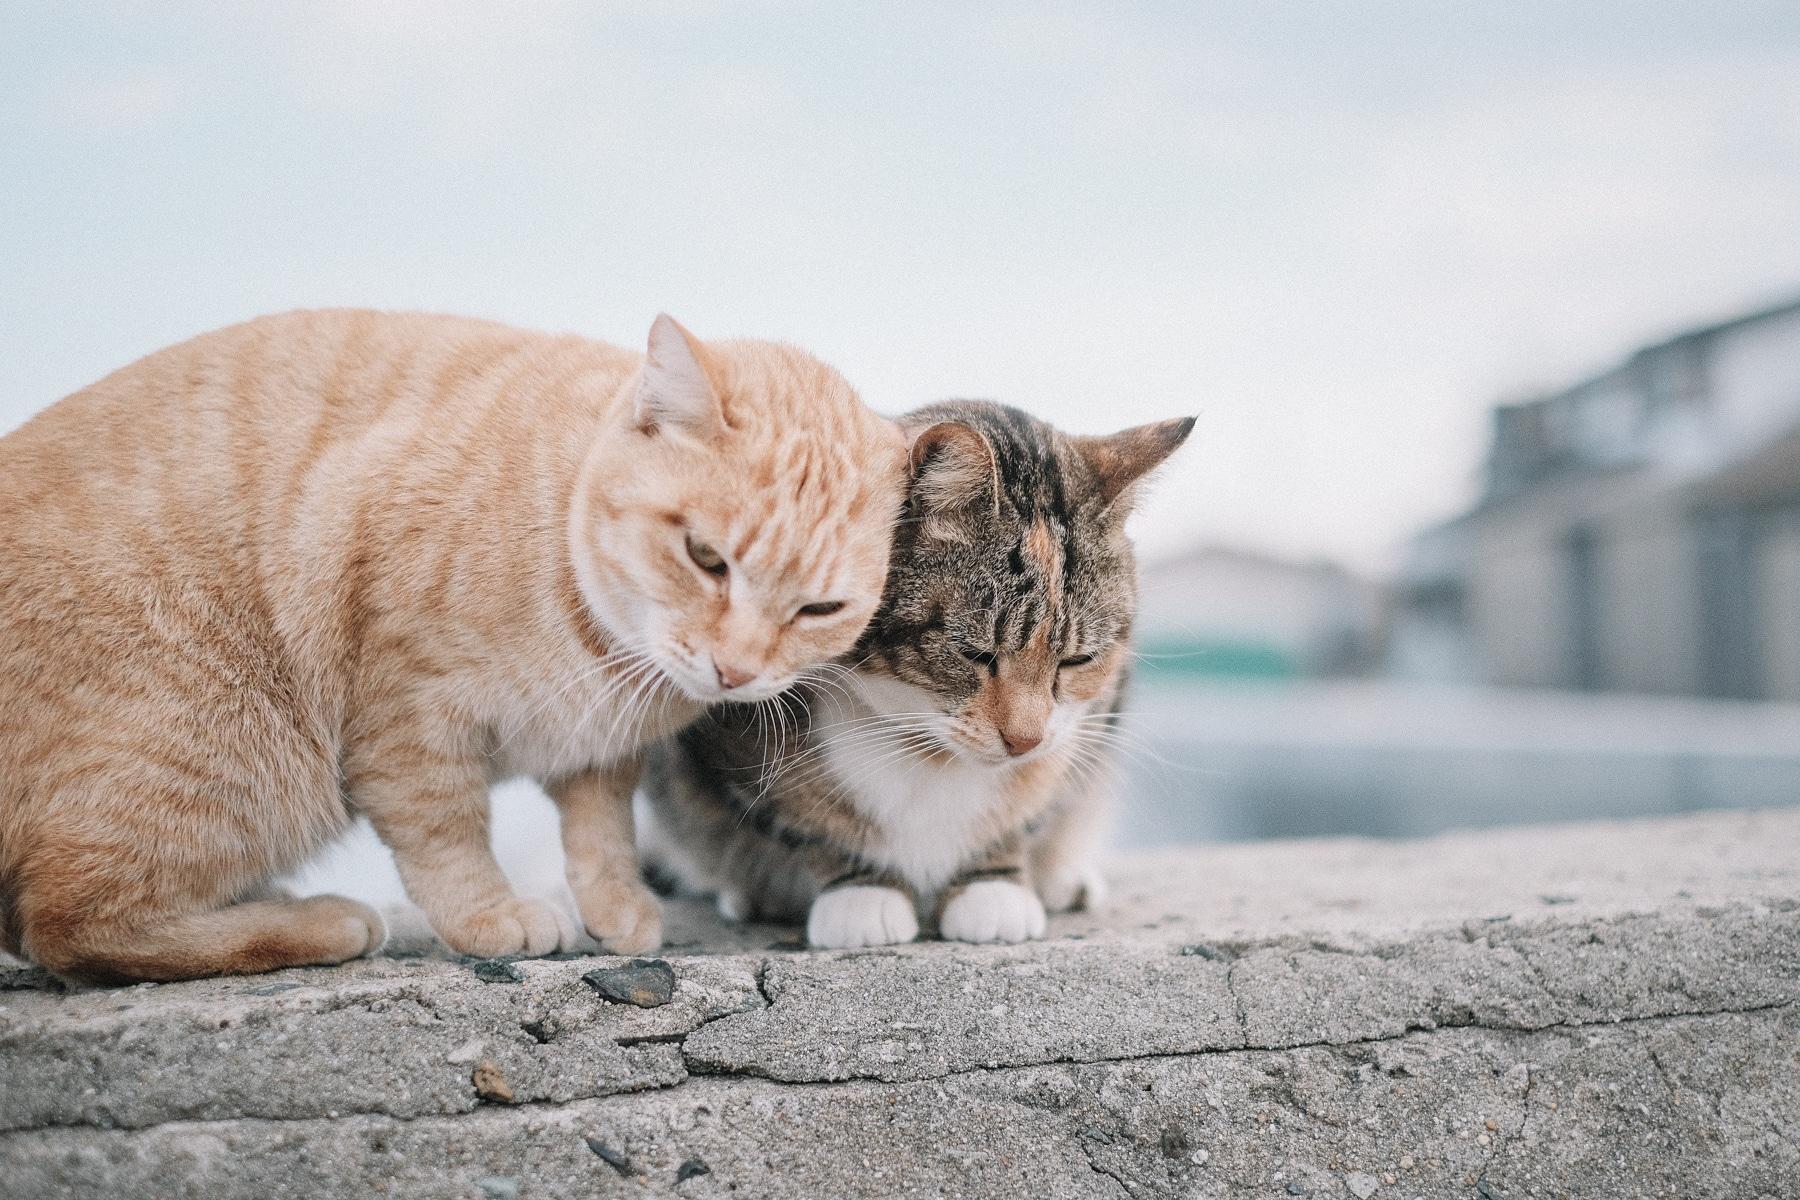 Kinlake-Japan-Cat-Island-5853